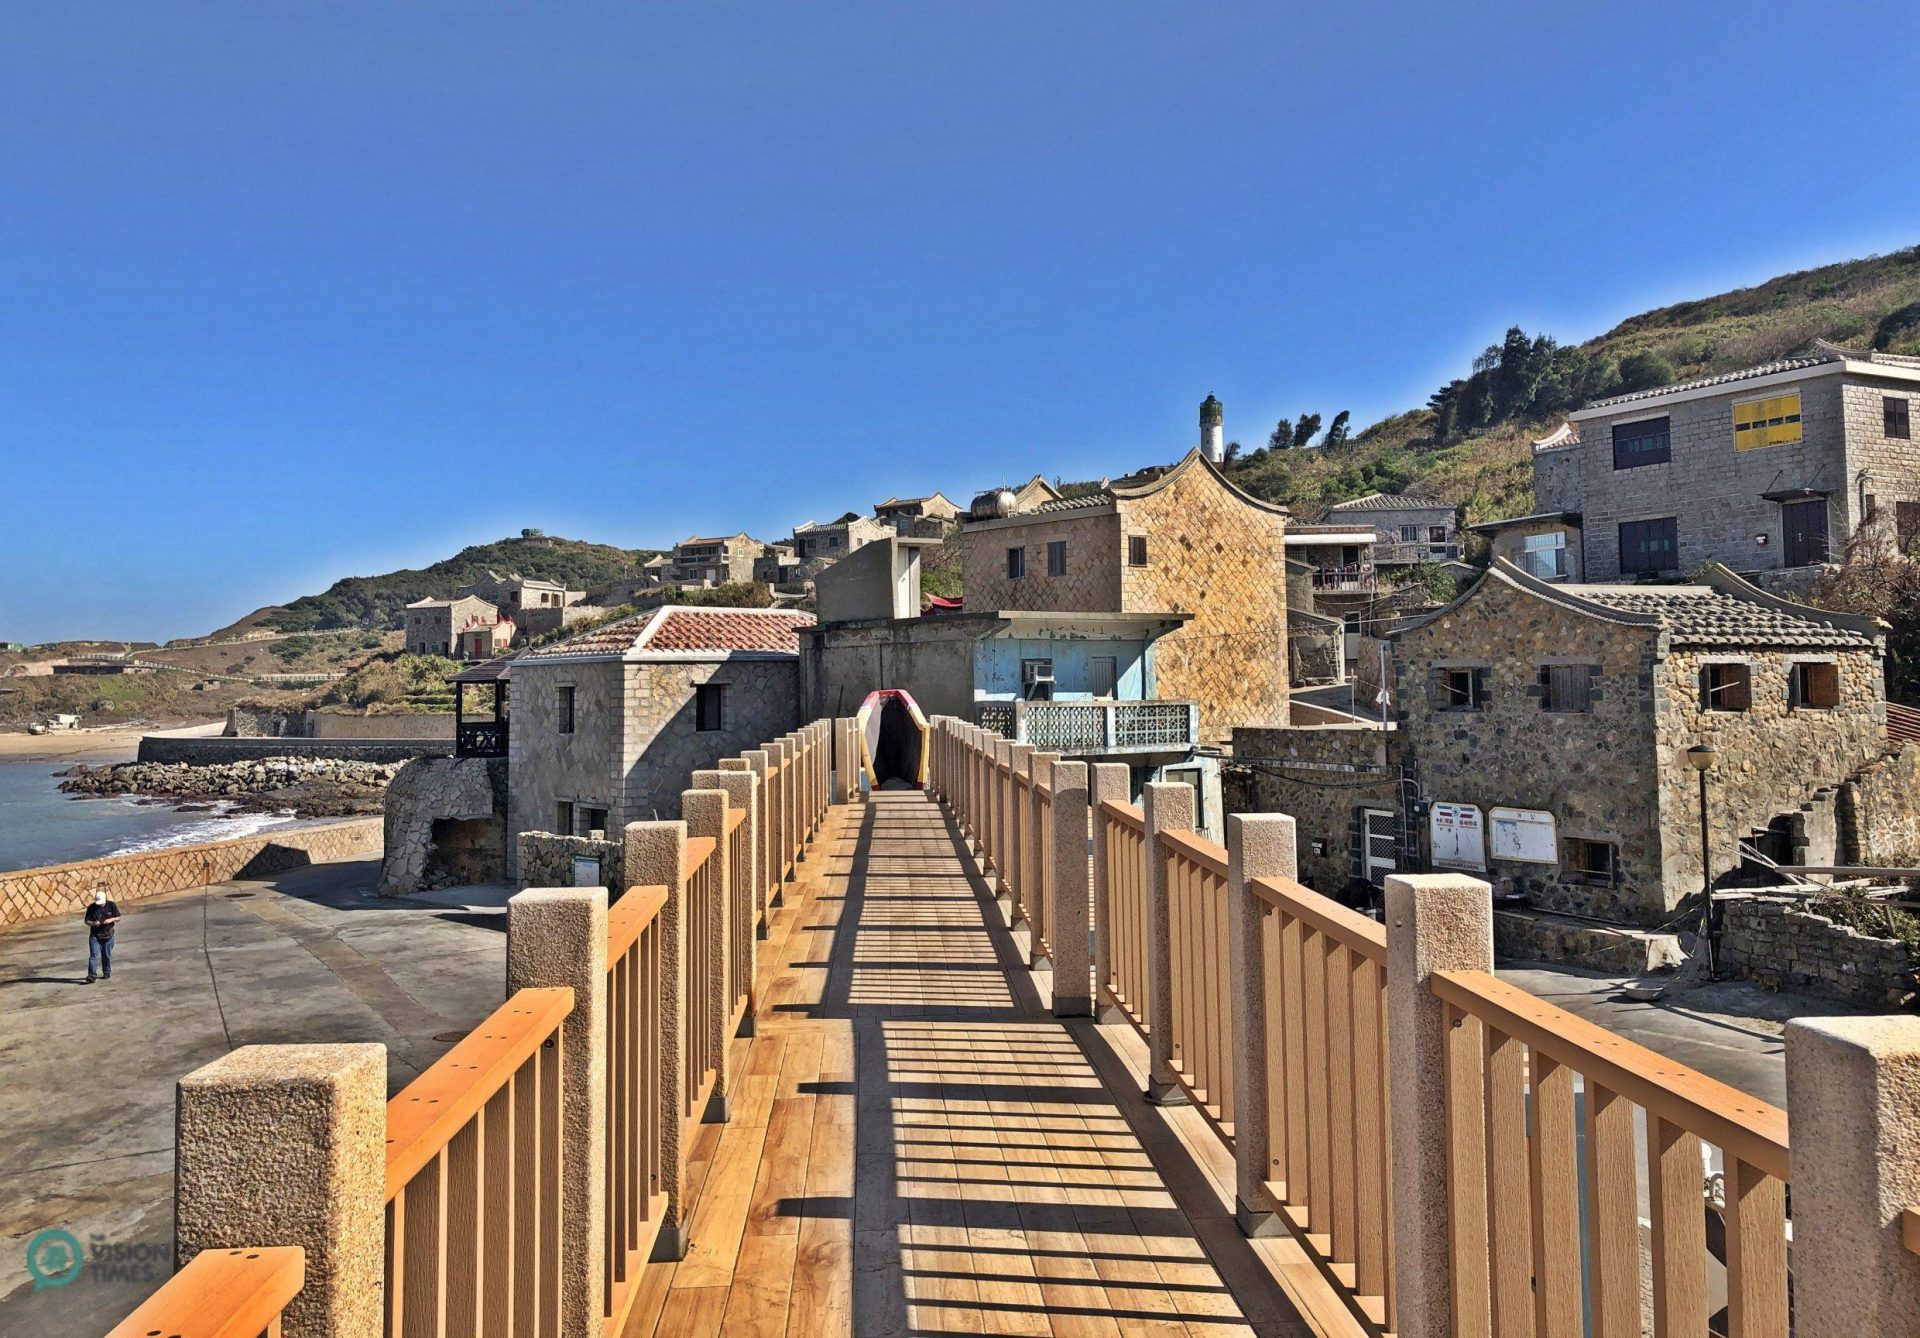 The Fuzheng Village in Matsu's Dongju. (Image: Billy Shyu / Vision Times)